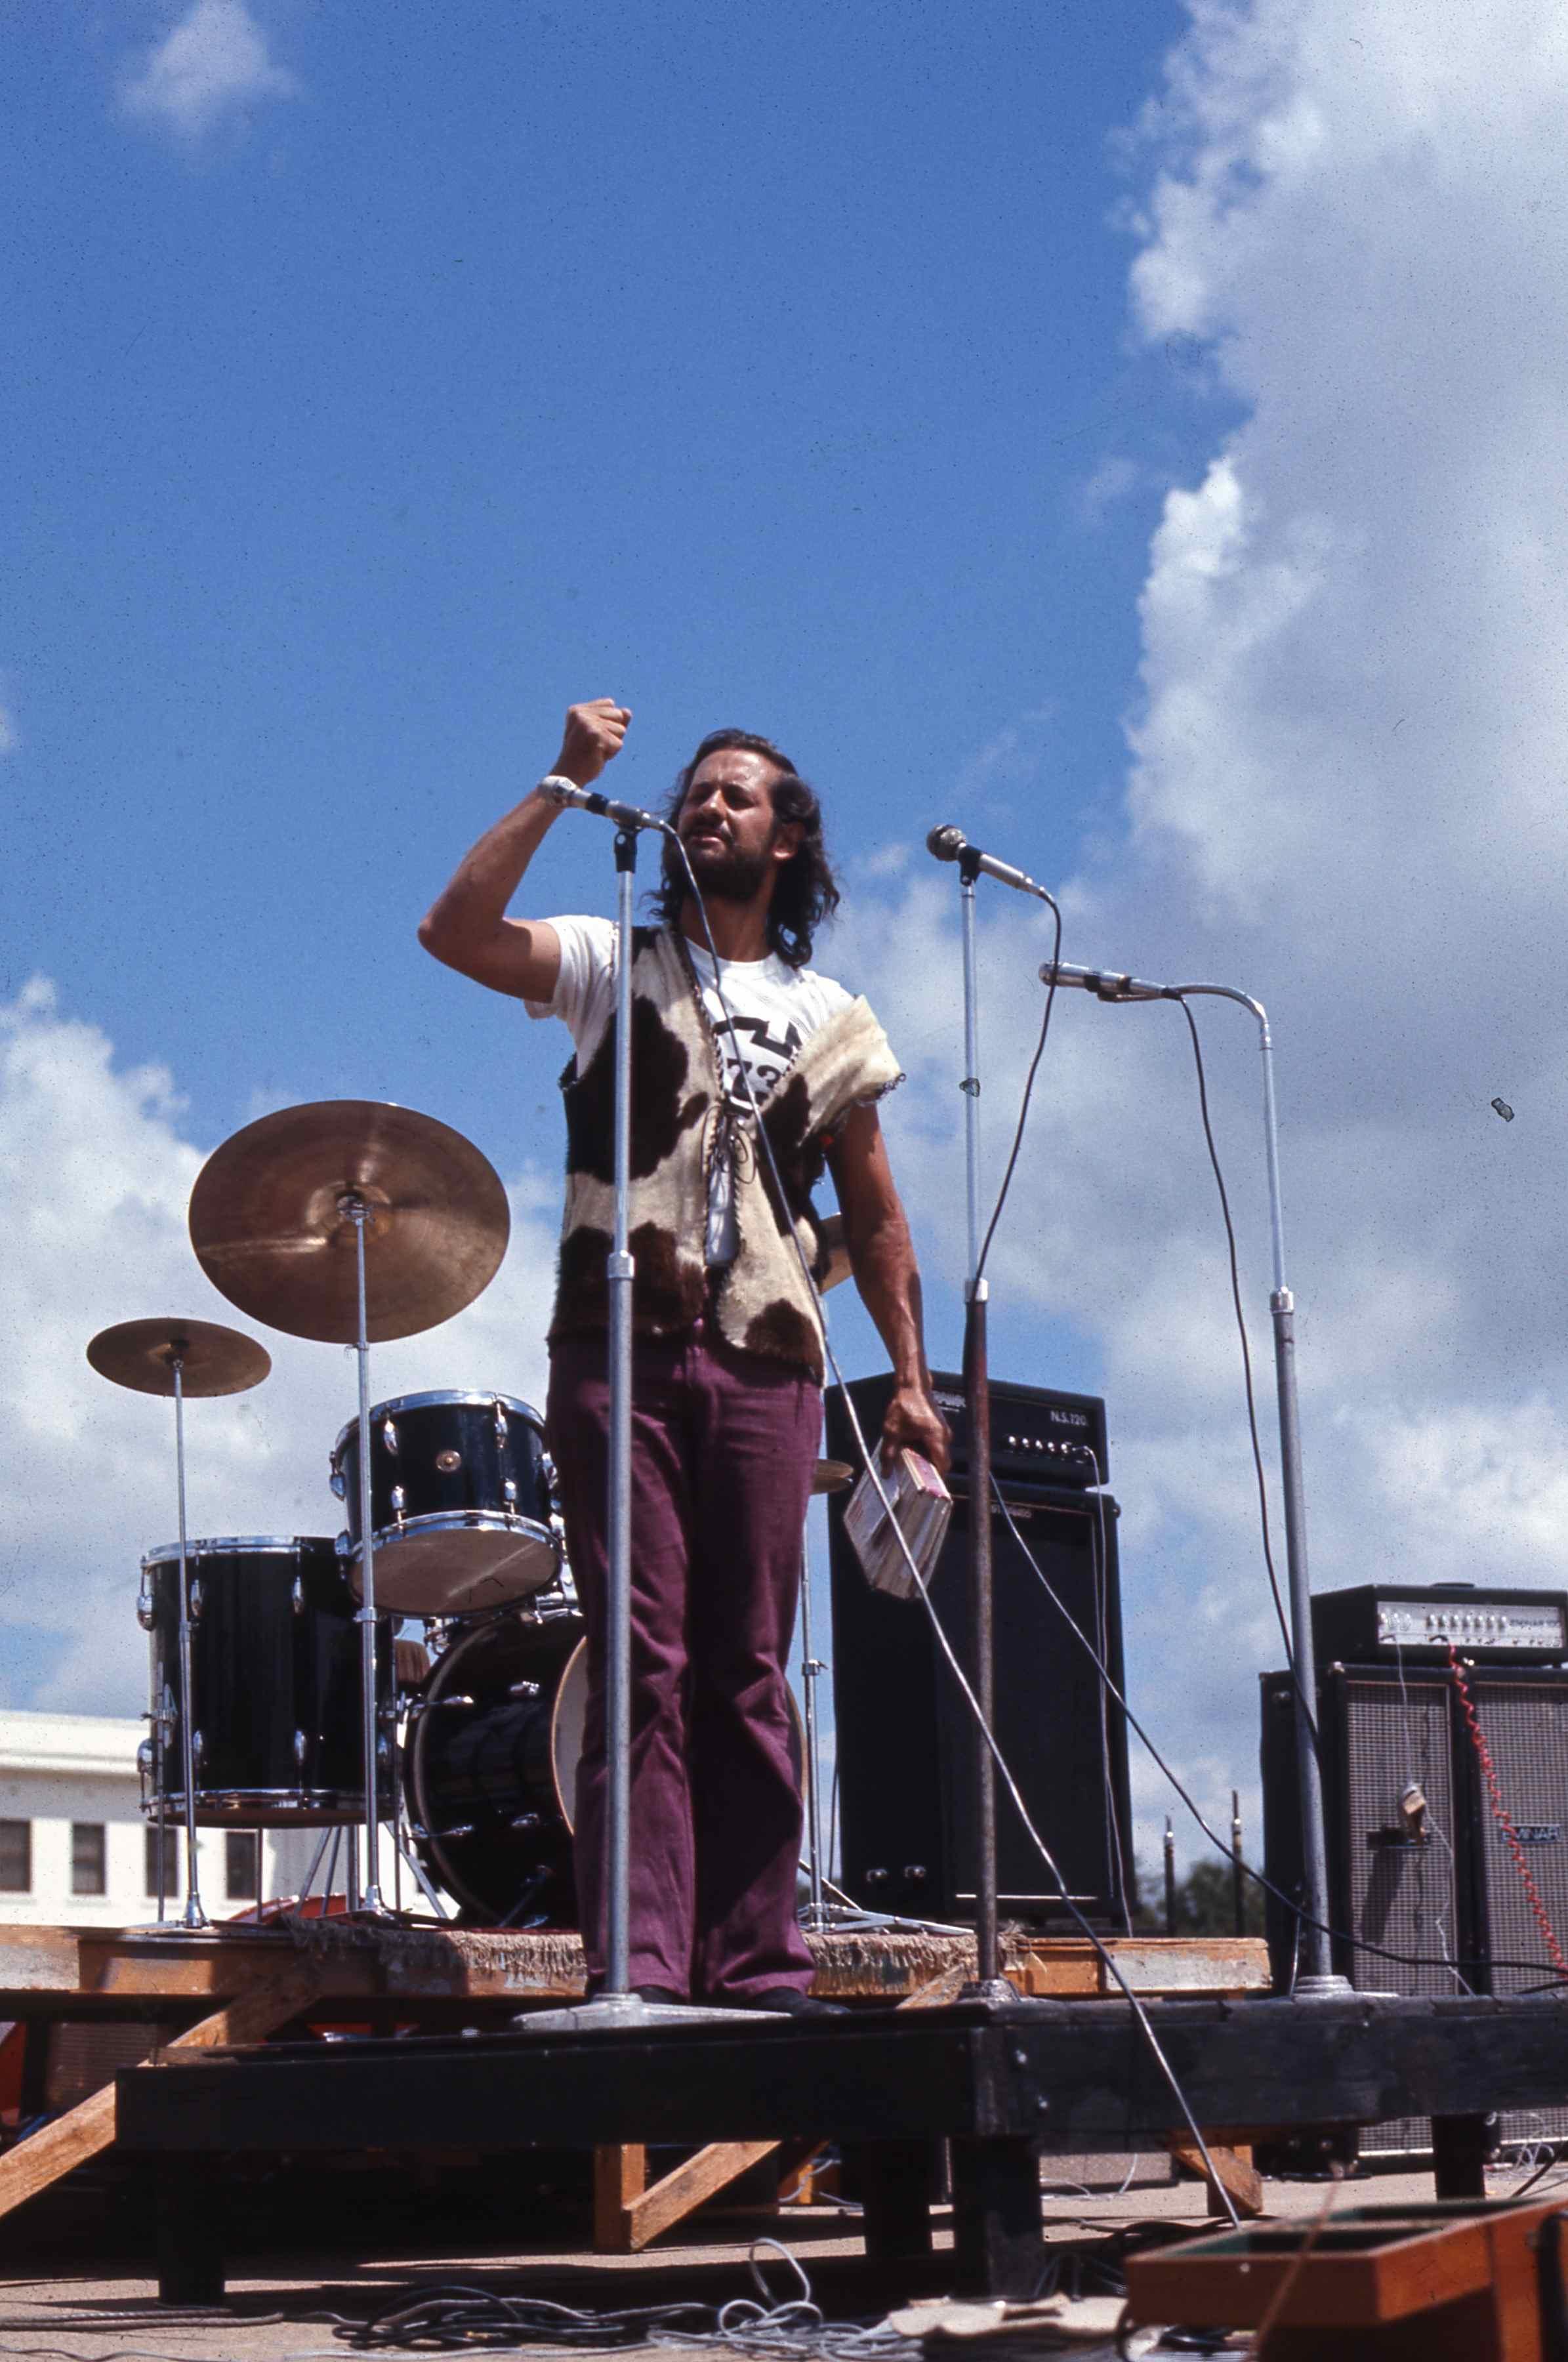 John Smith at a Parliament House rally 1973